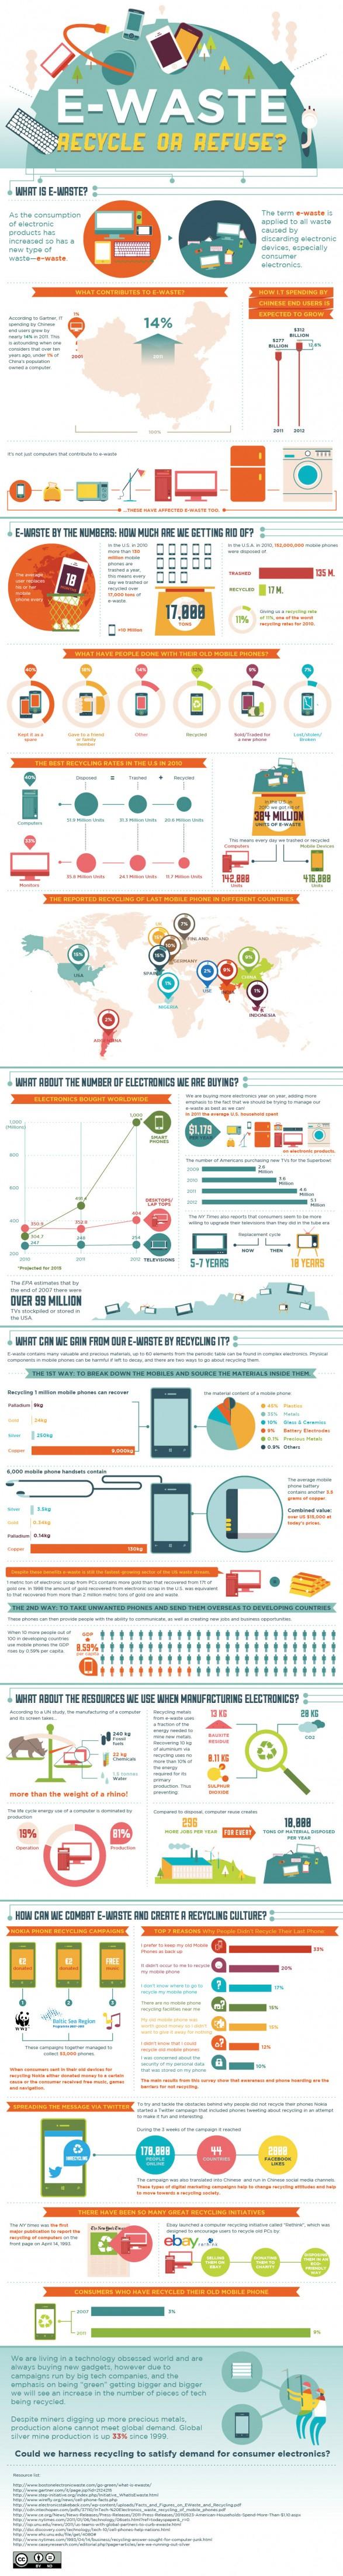 Infographic E-waste